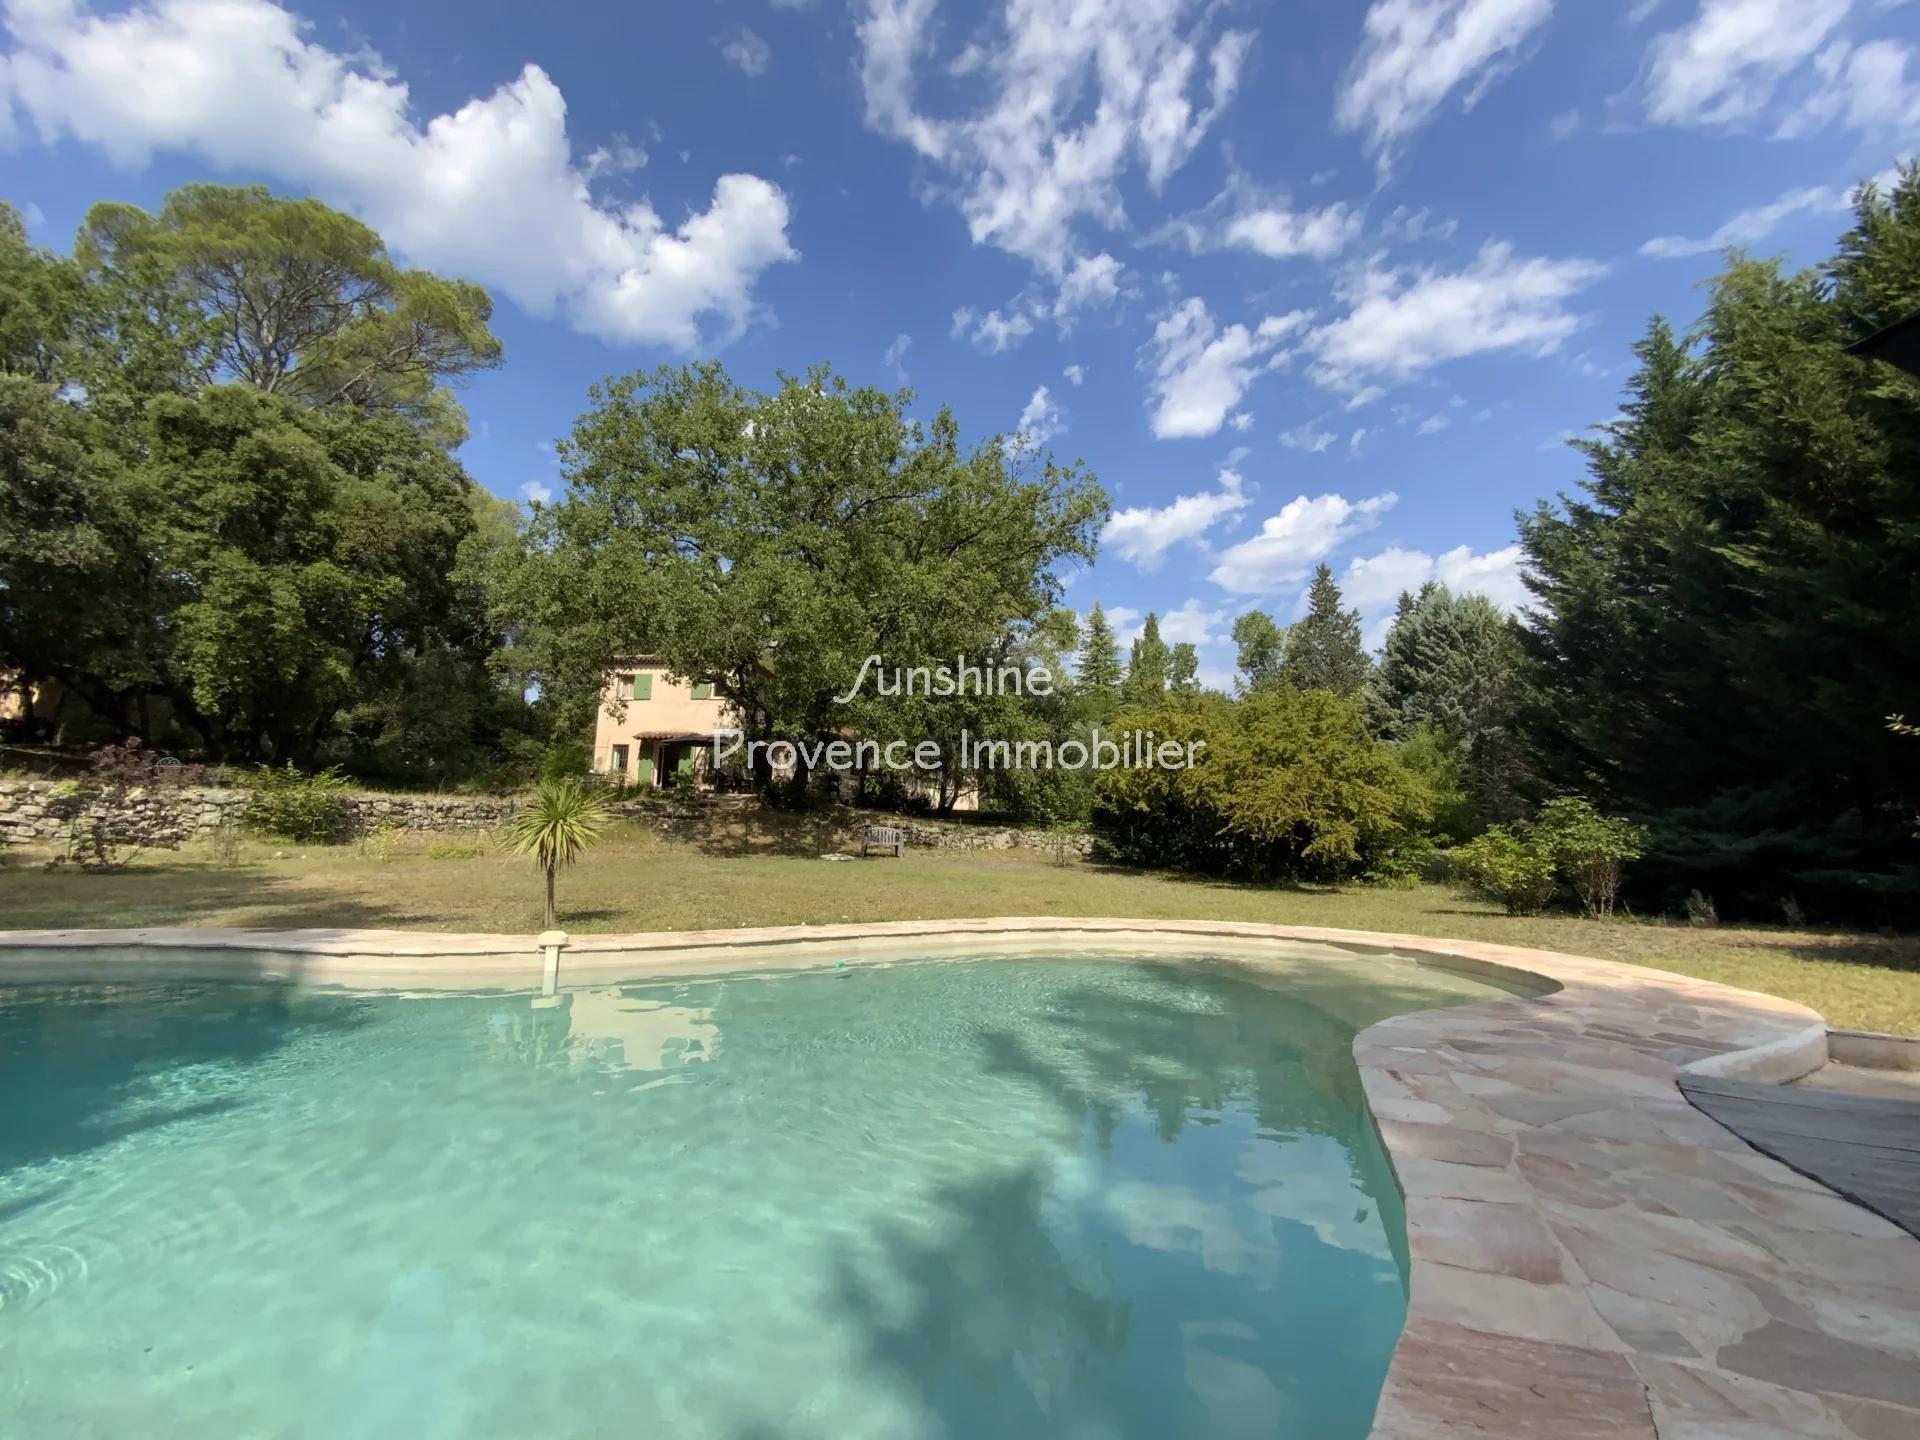 Provençal house - 4500m² land - 4 bedrooms - swimming pool